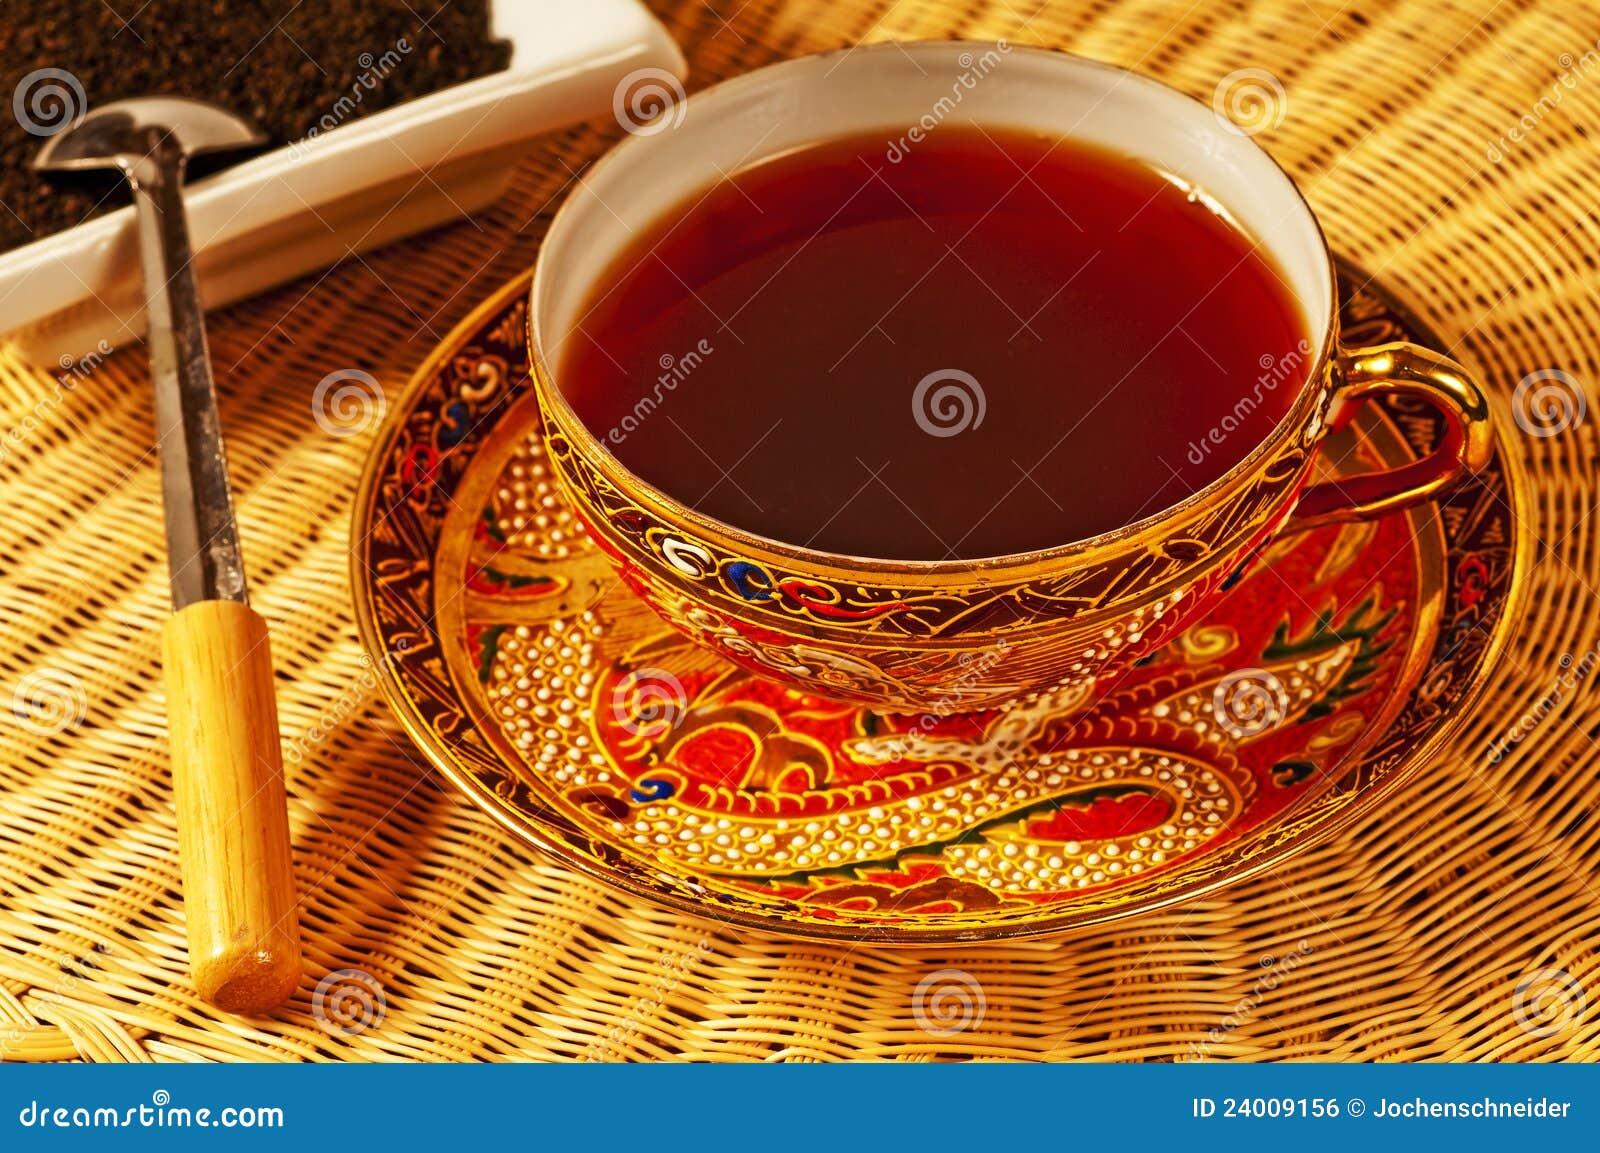 Zwarte thee van Ceylon